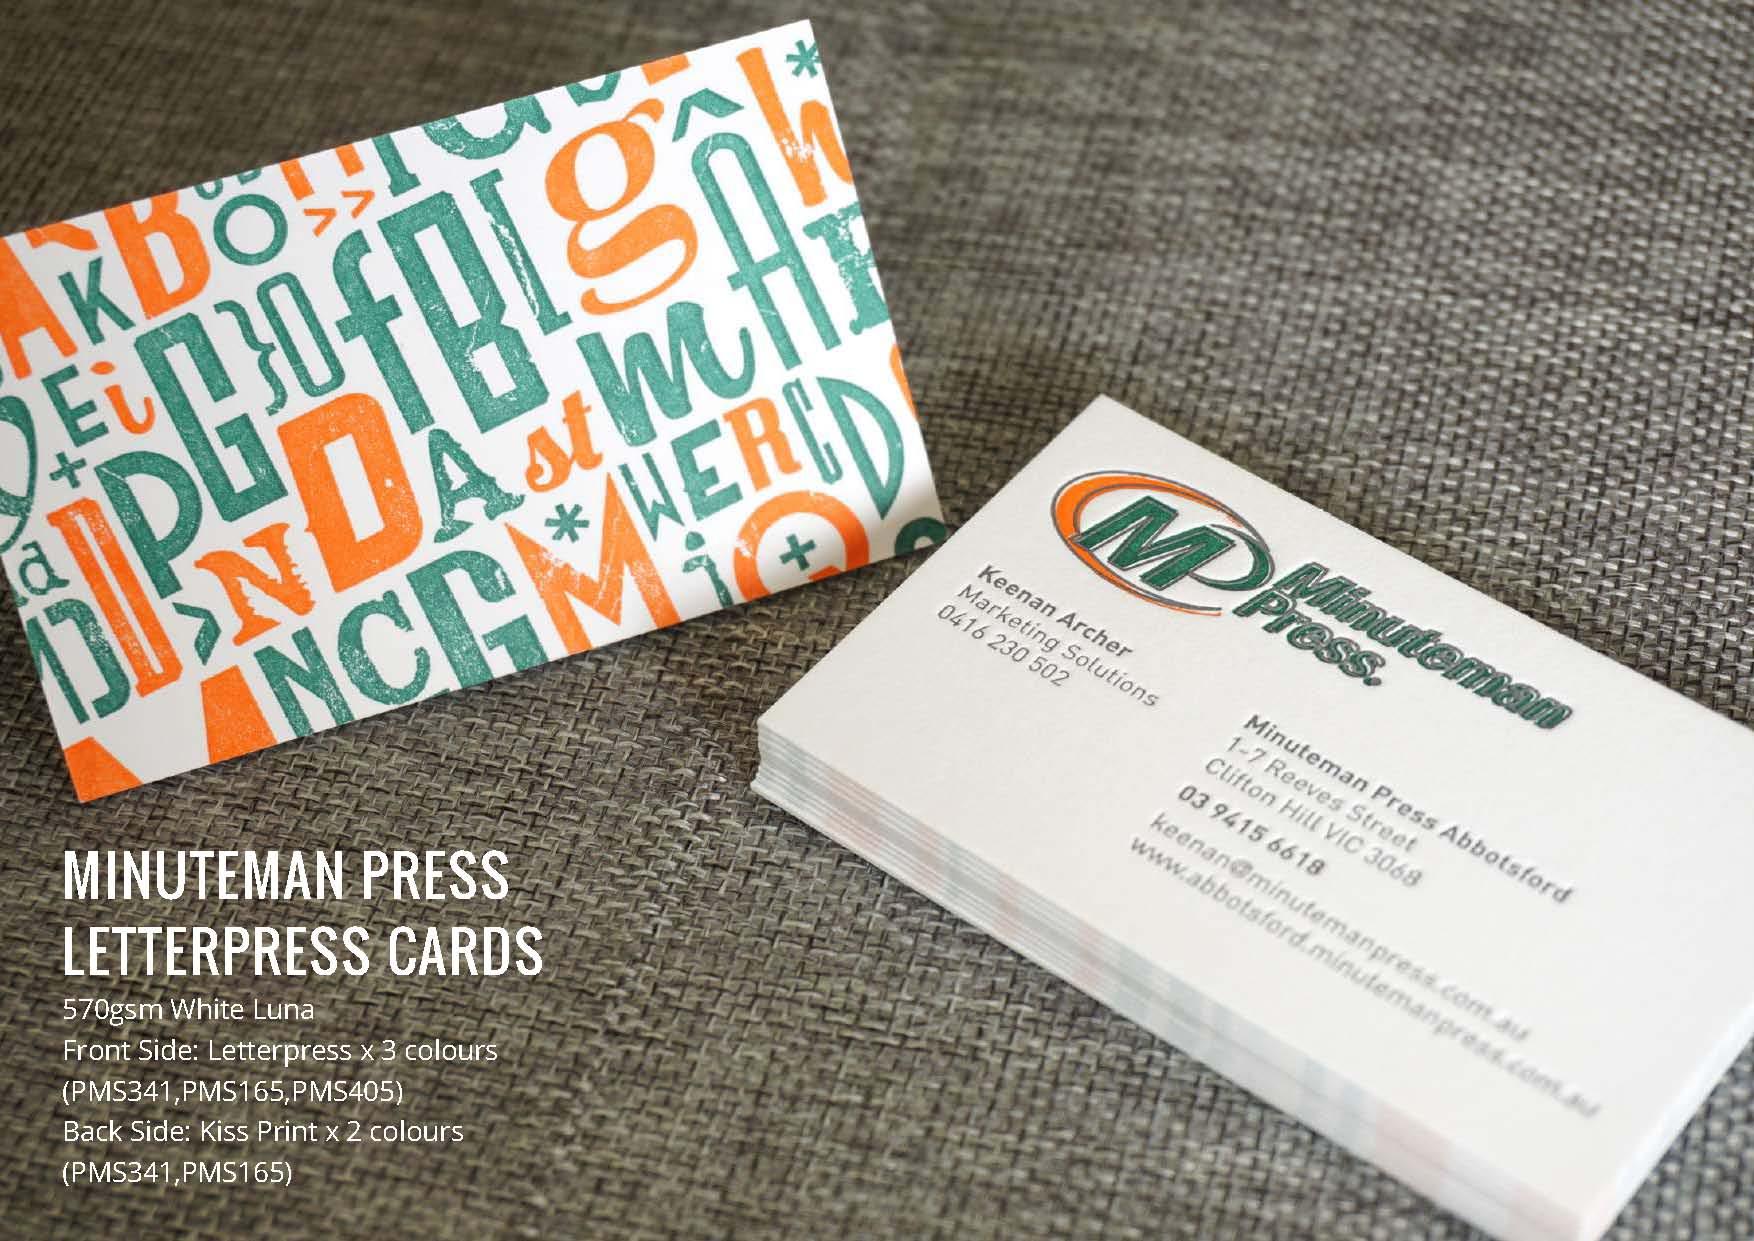 Letterpress Cards | My Fancy Cards